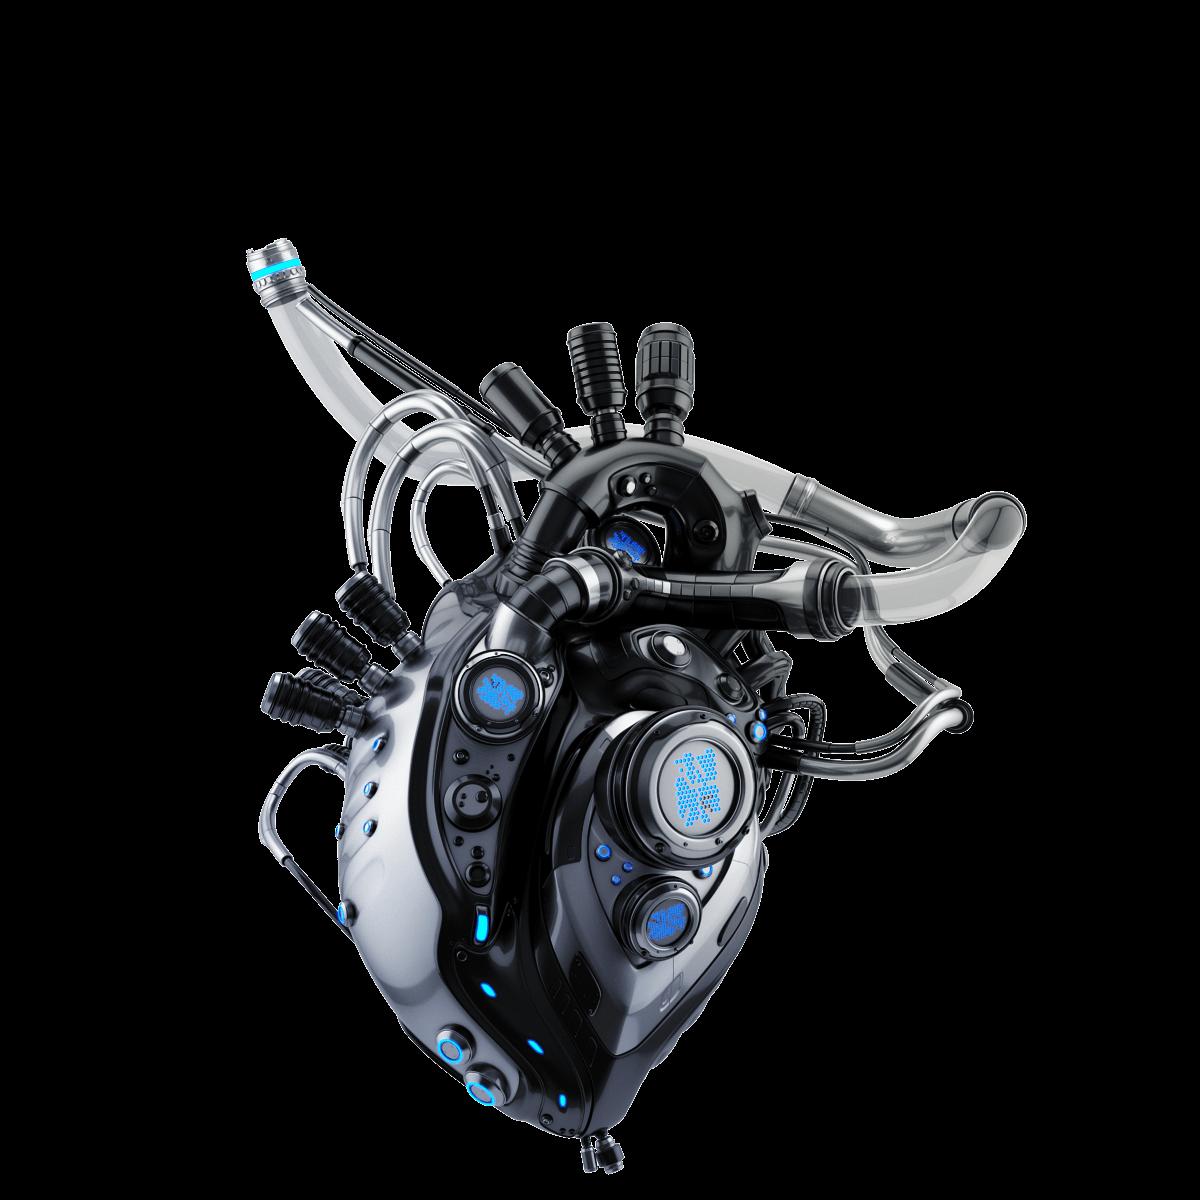 heart 4 00001